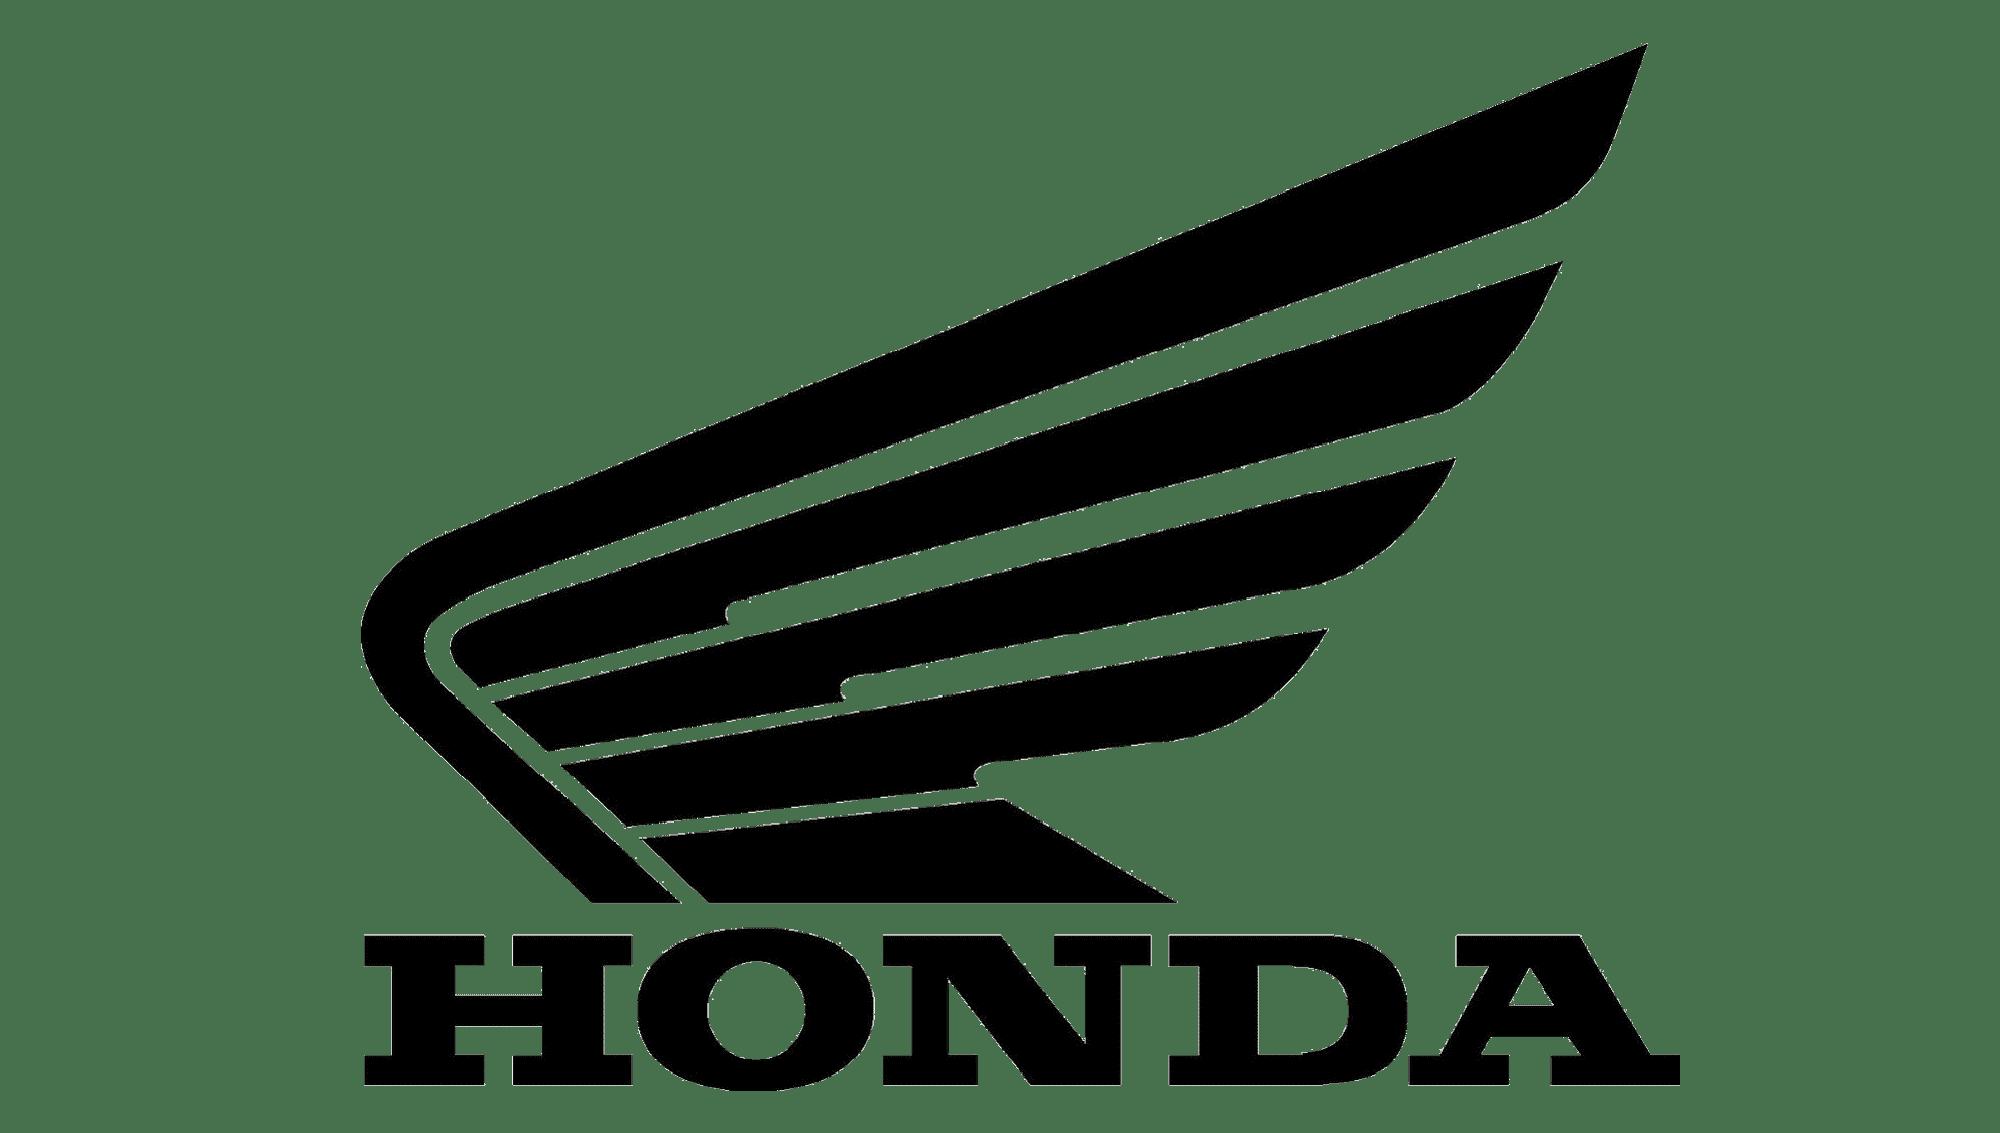 Honda-Moto-Simbolo